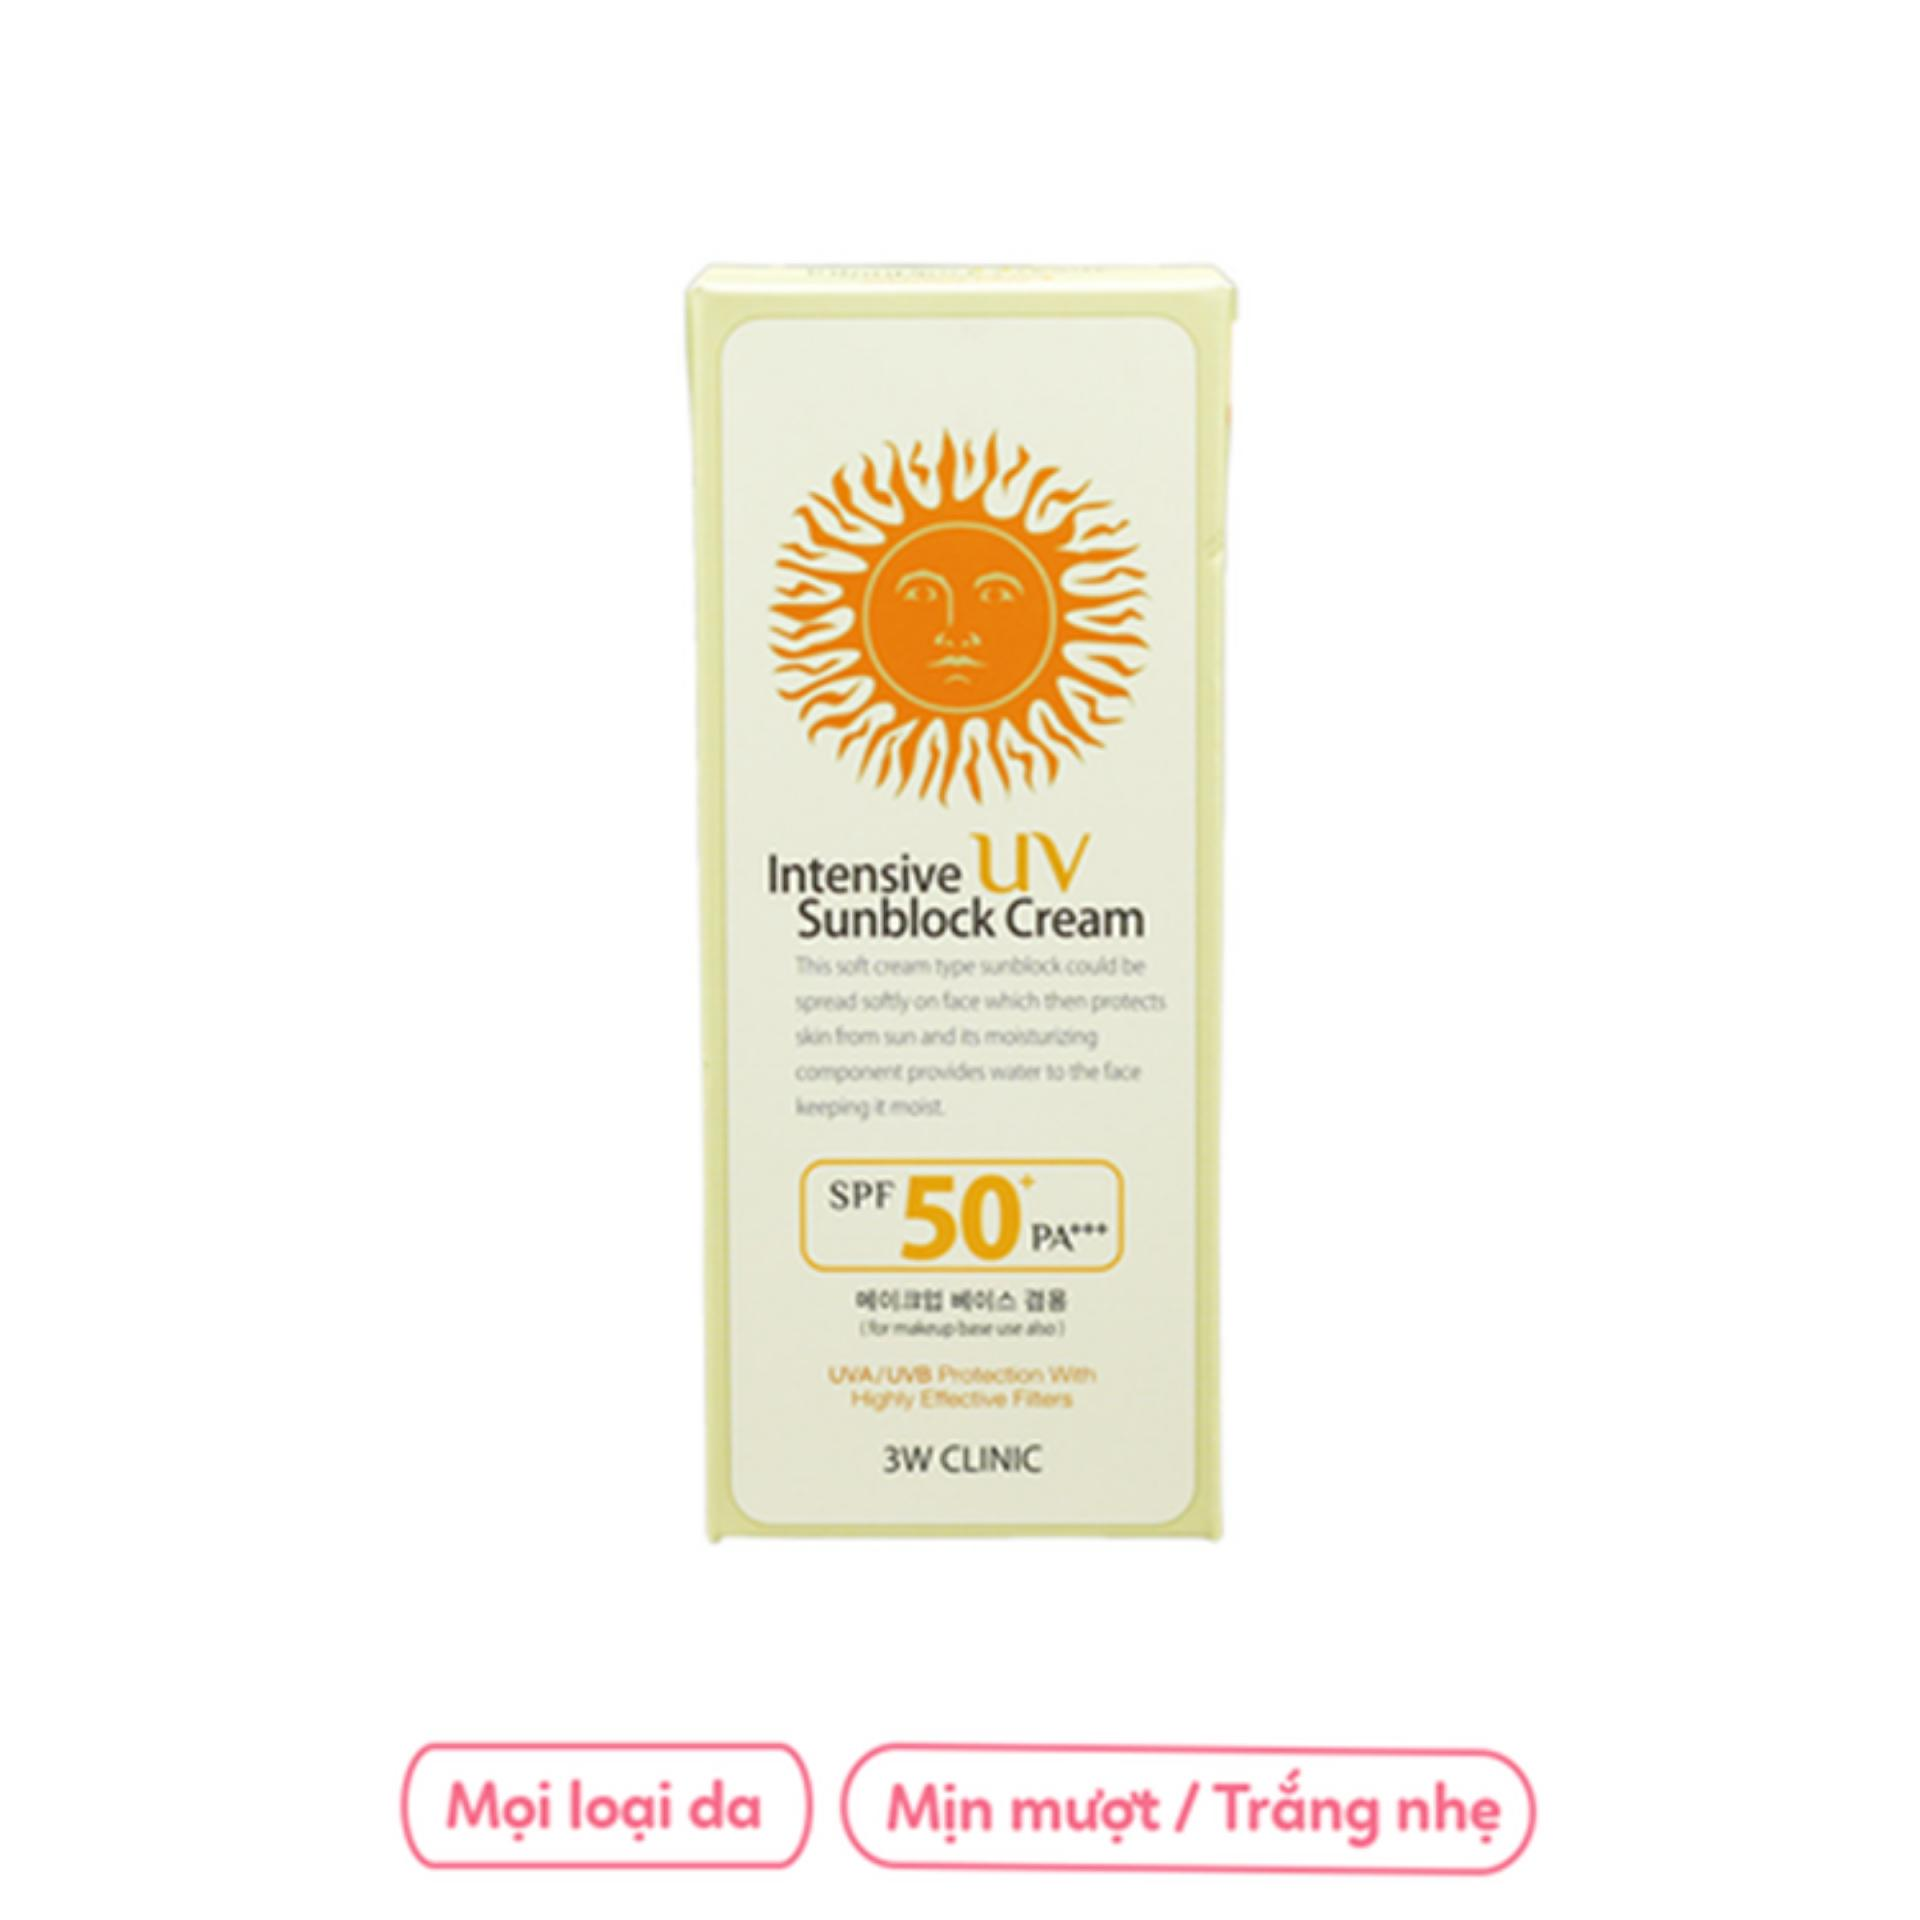 Kem chống nắng 3W Clinic Intensive UV Sunblock Cream SPF 50+ PA+++